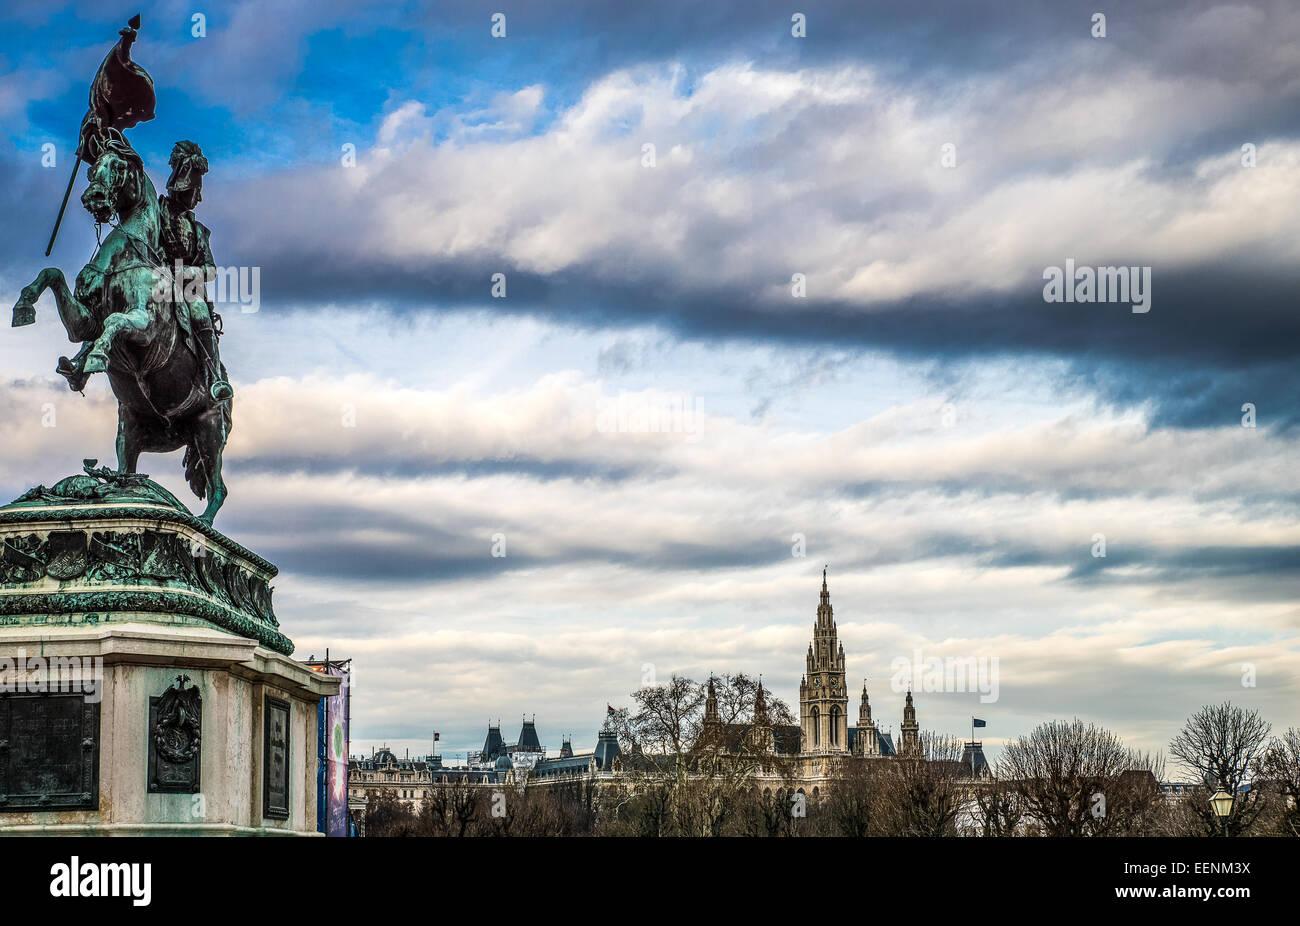 Austria, Vienna, Heldenplatz, the equestrian monument of the Archduke Karl - Stock Image